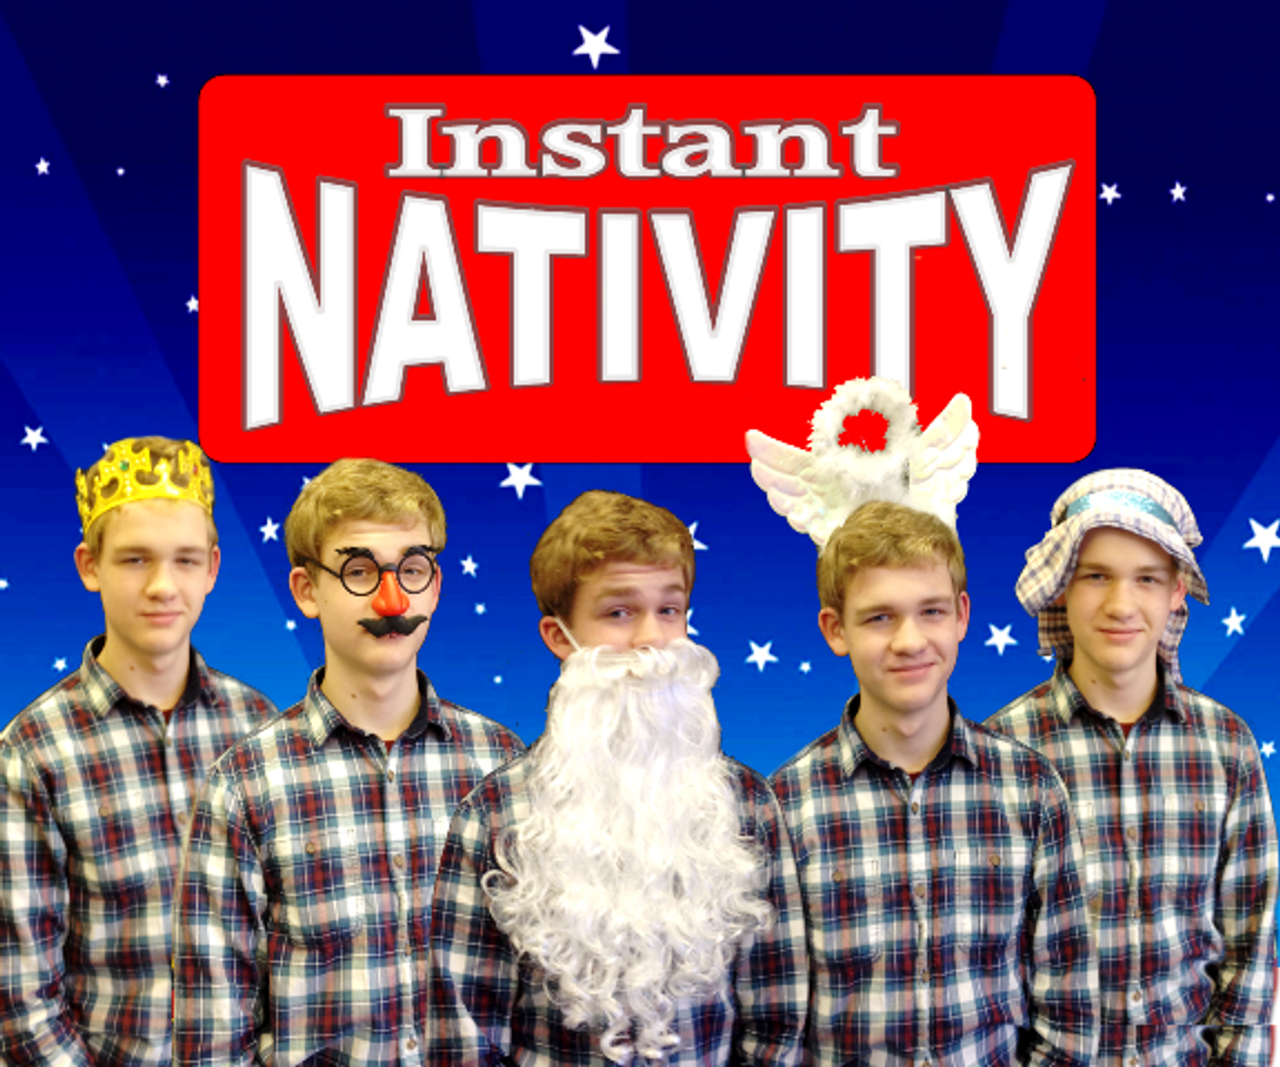 Instant Nativity Play Magic Trick